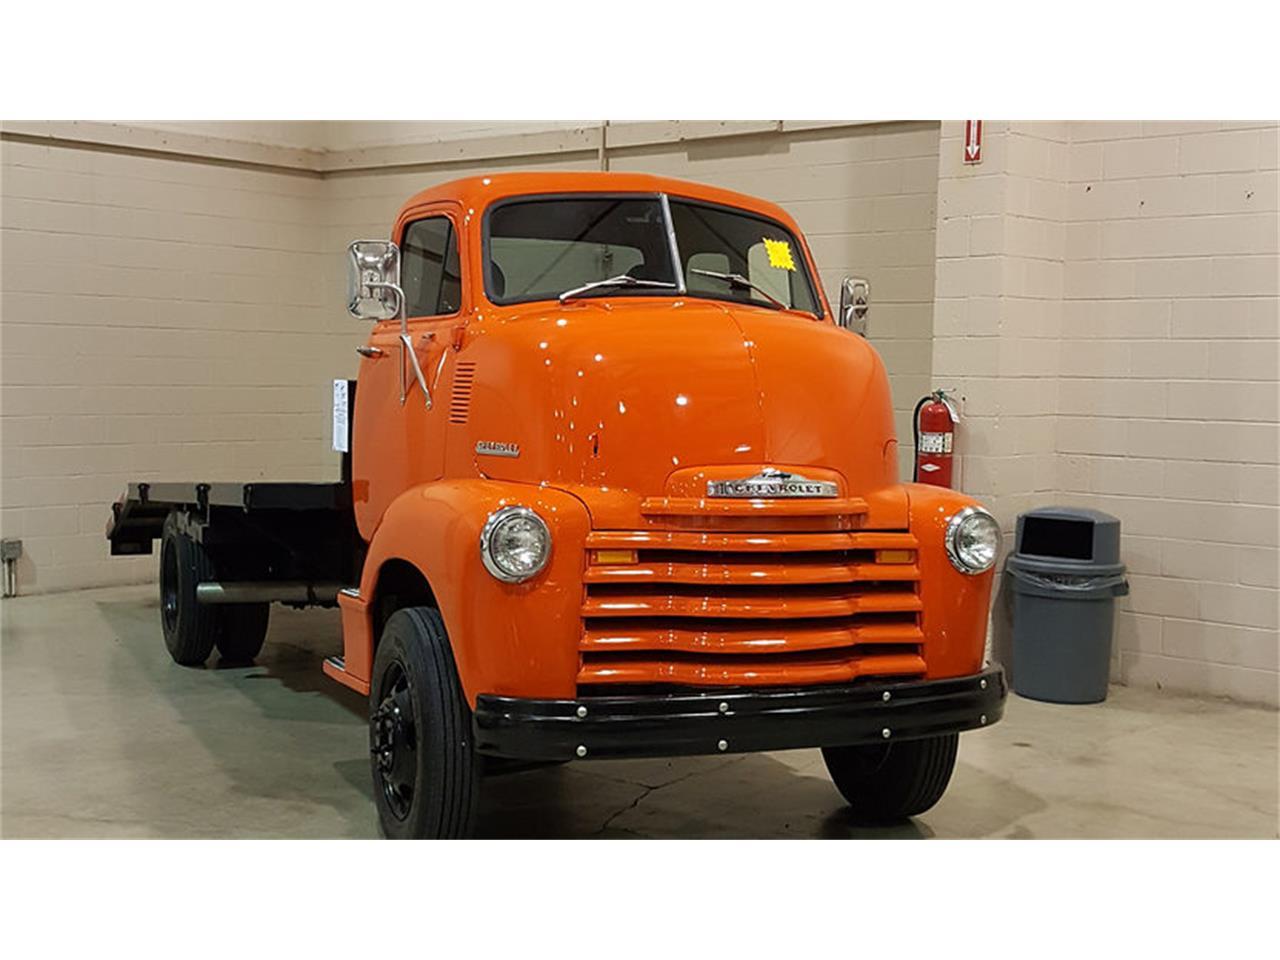 1949 Chevrolet Coe Car Hauler For Sale Classiccars Com Cc 953035